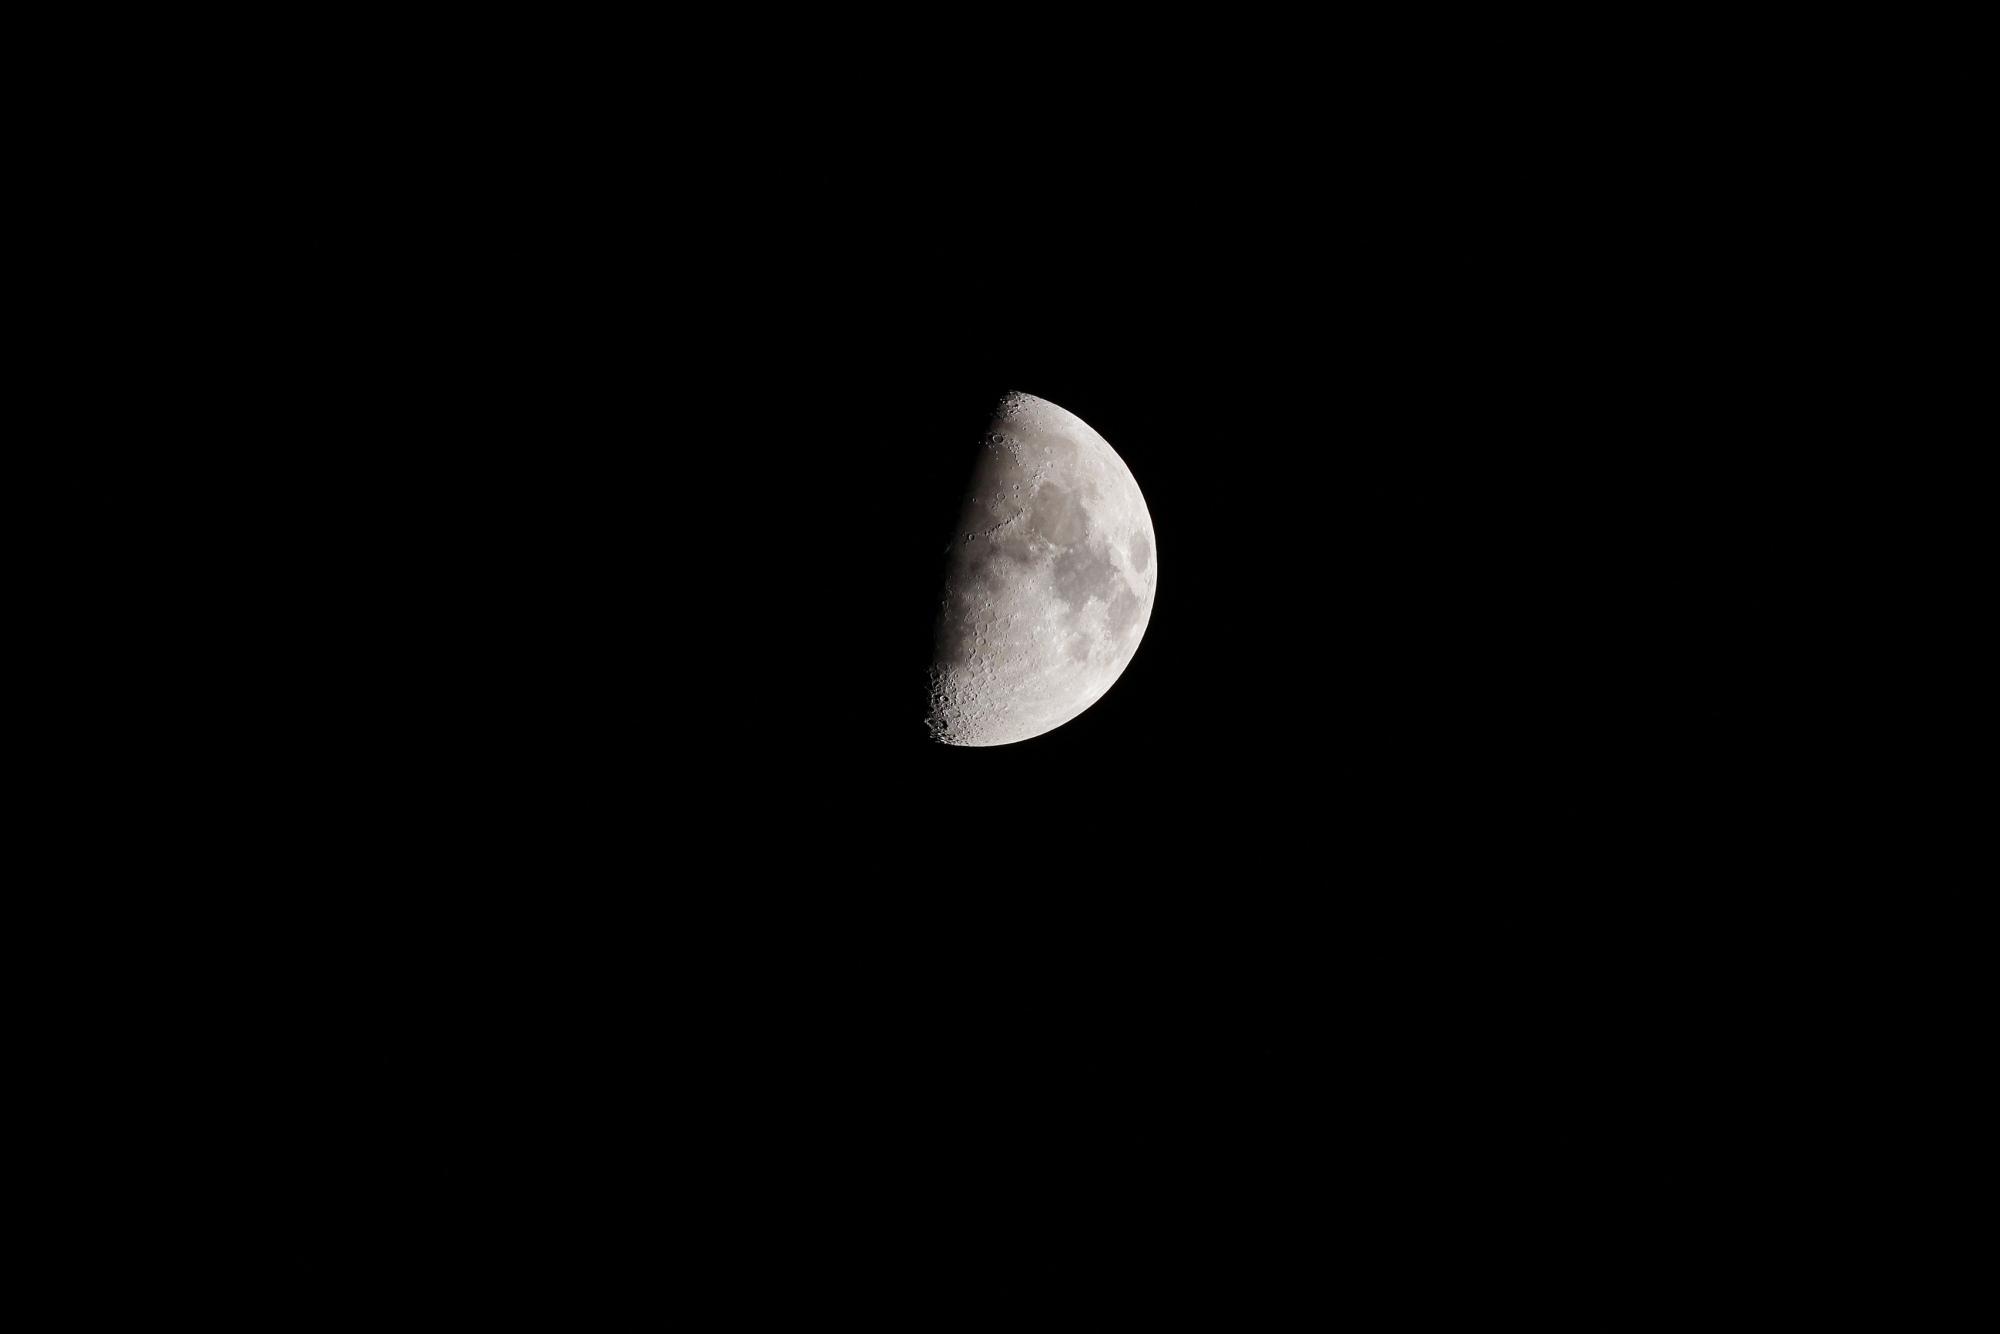 5c646dd857cef_lune13_02_2019.thumb.JPG.c3d5a3841b91b29f096e4c83667f34d2.JPG